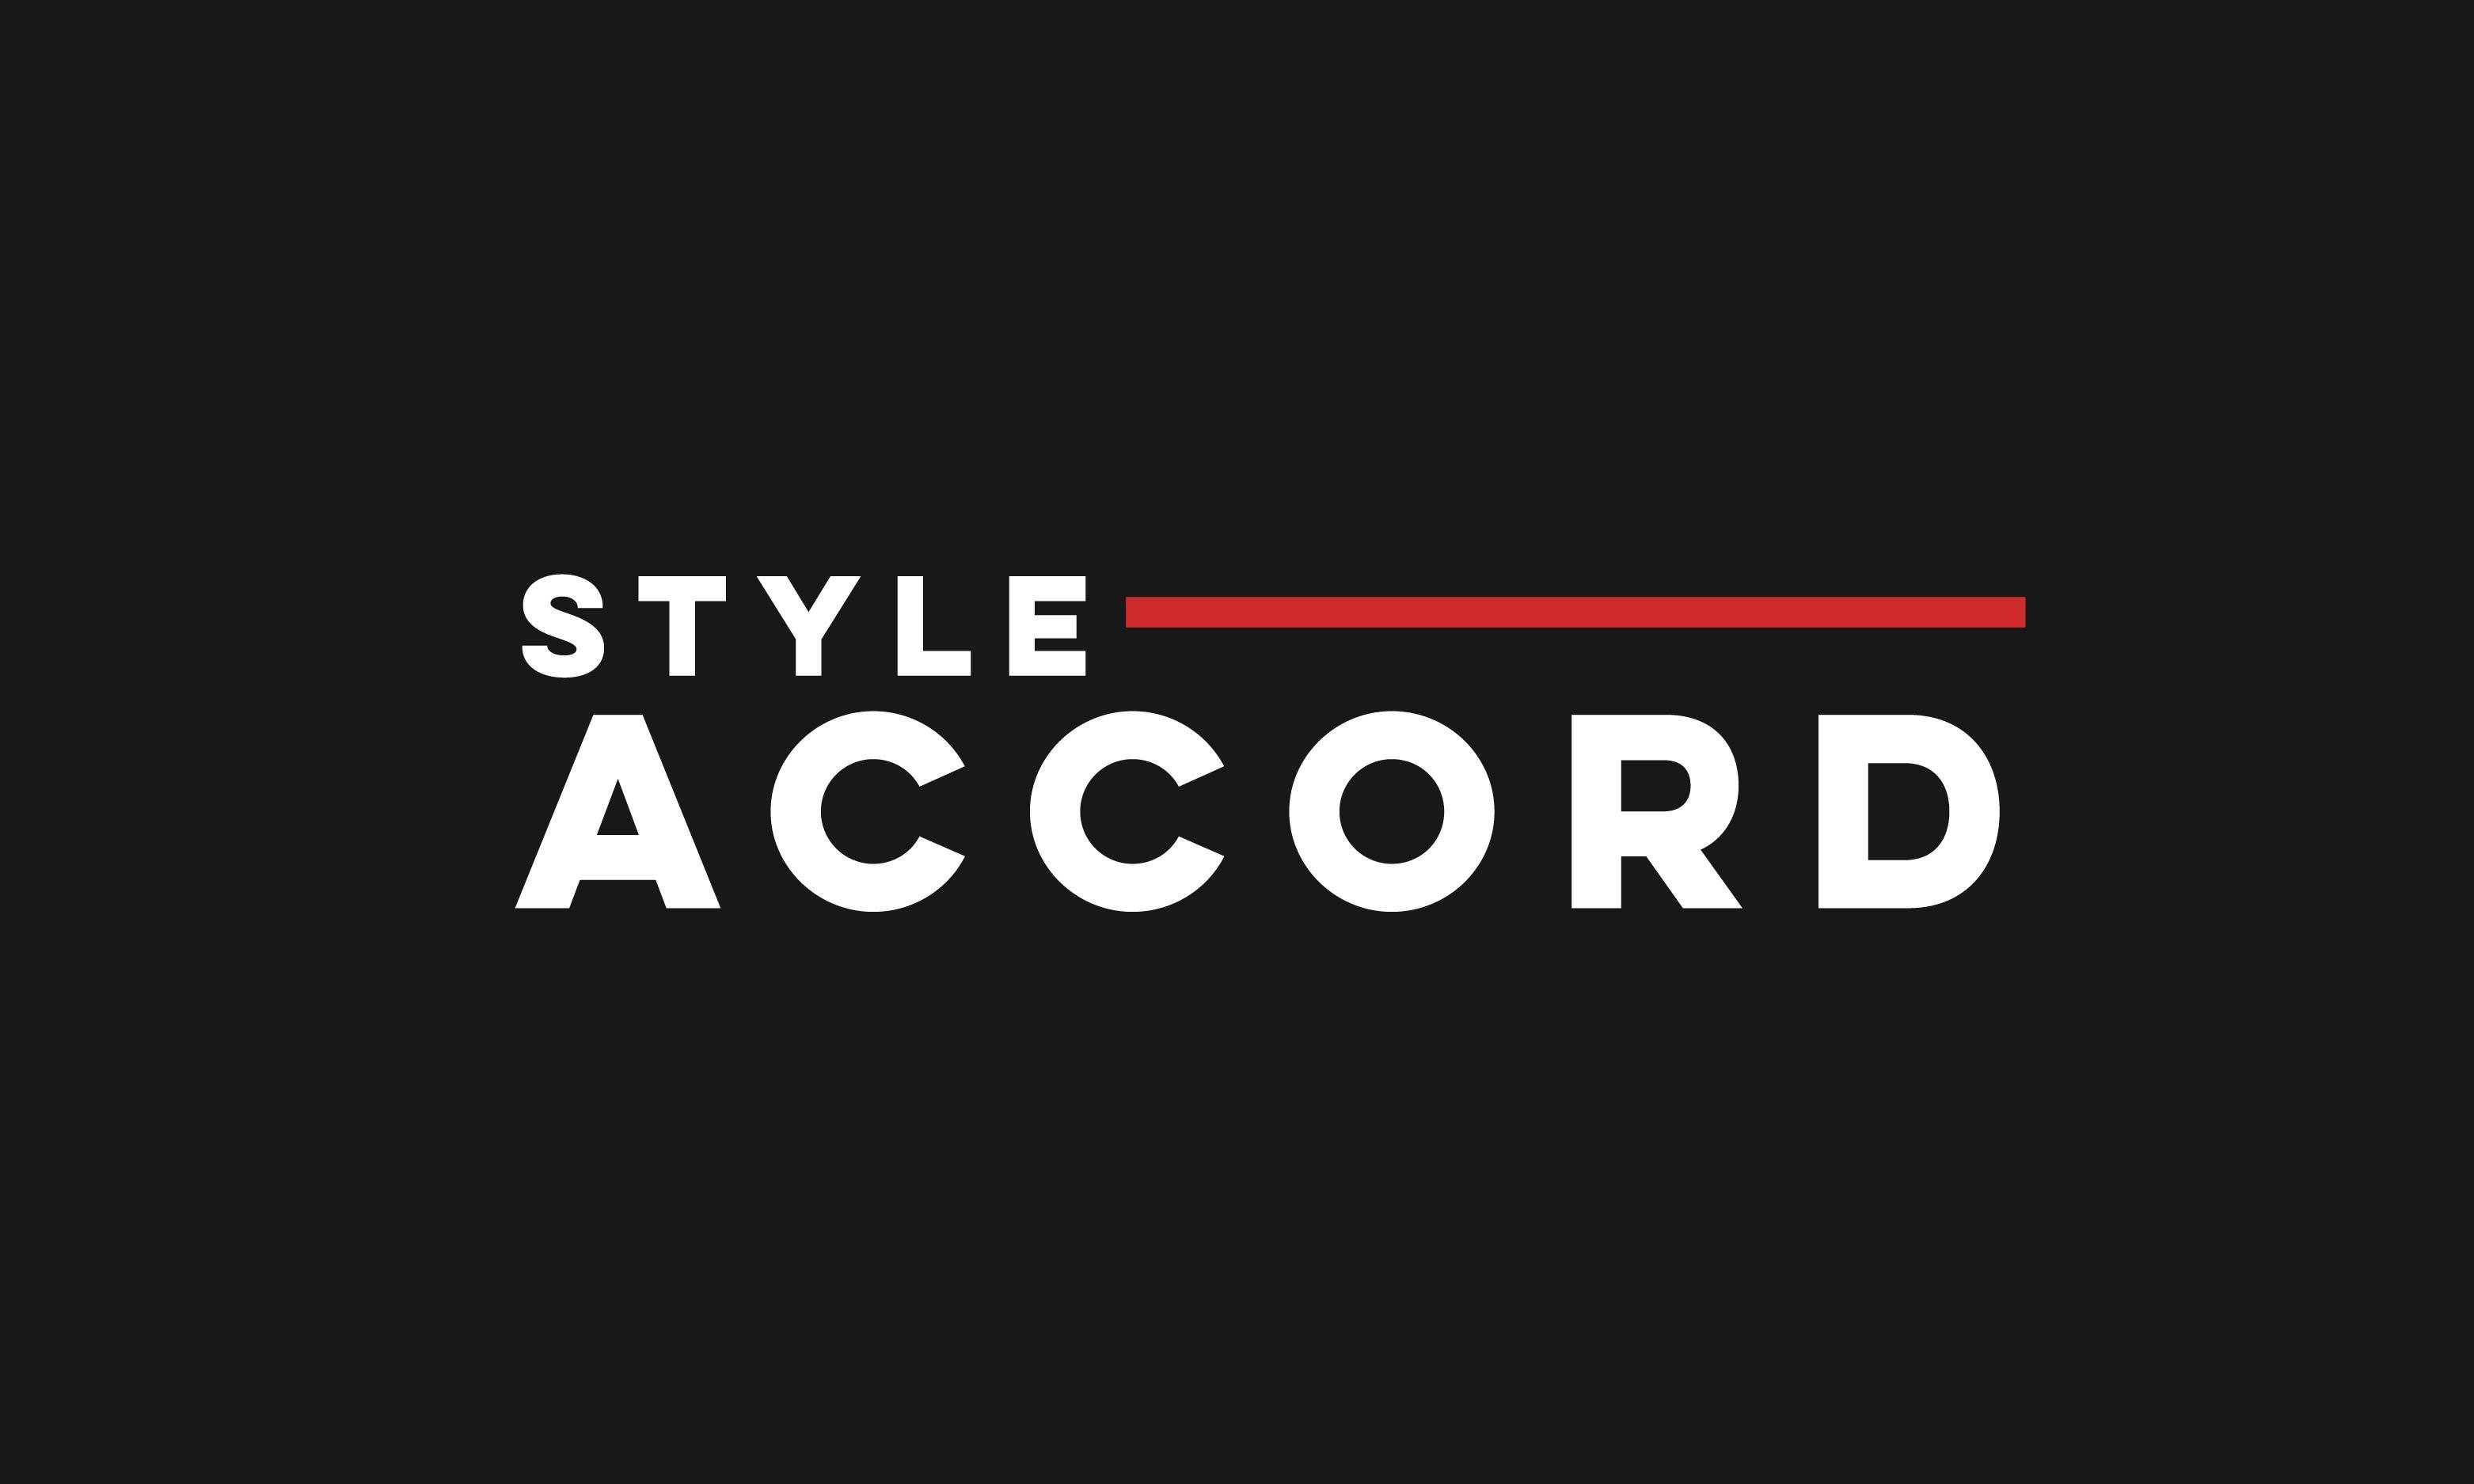 StyleAccord.com